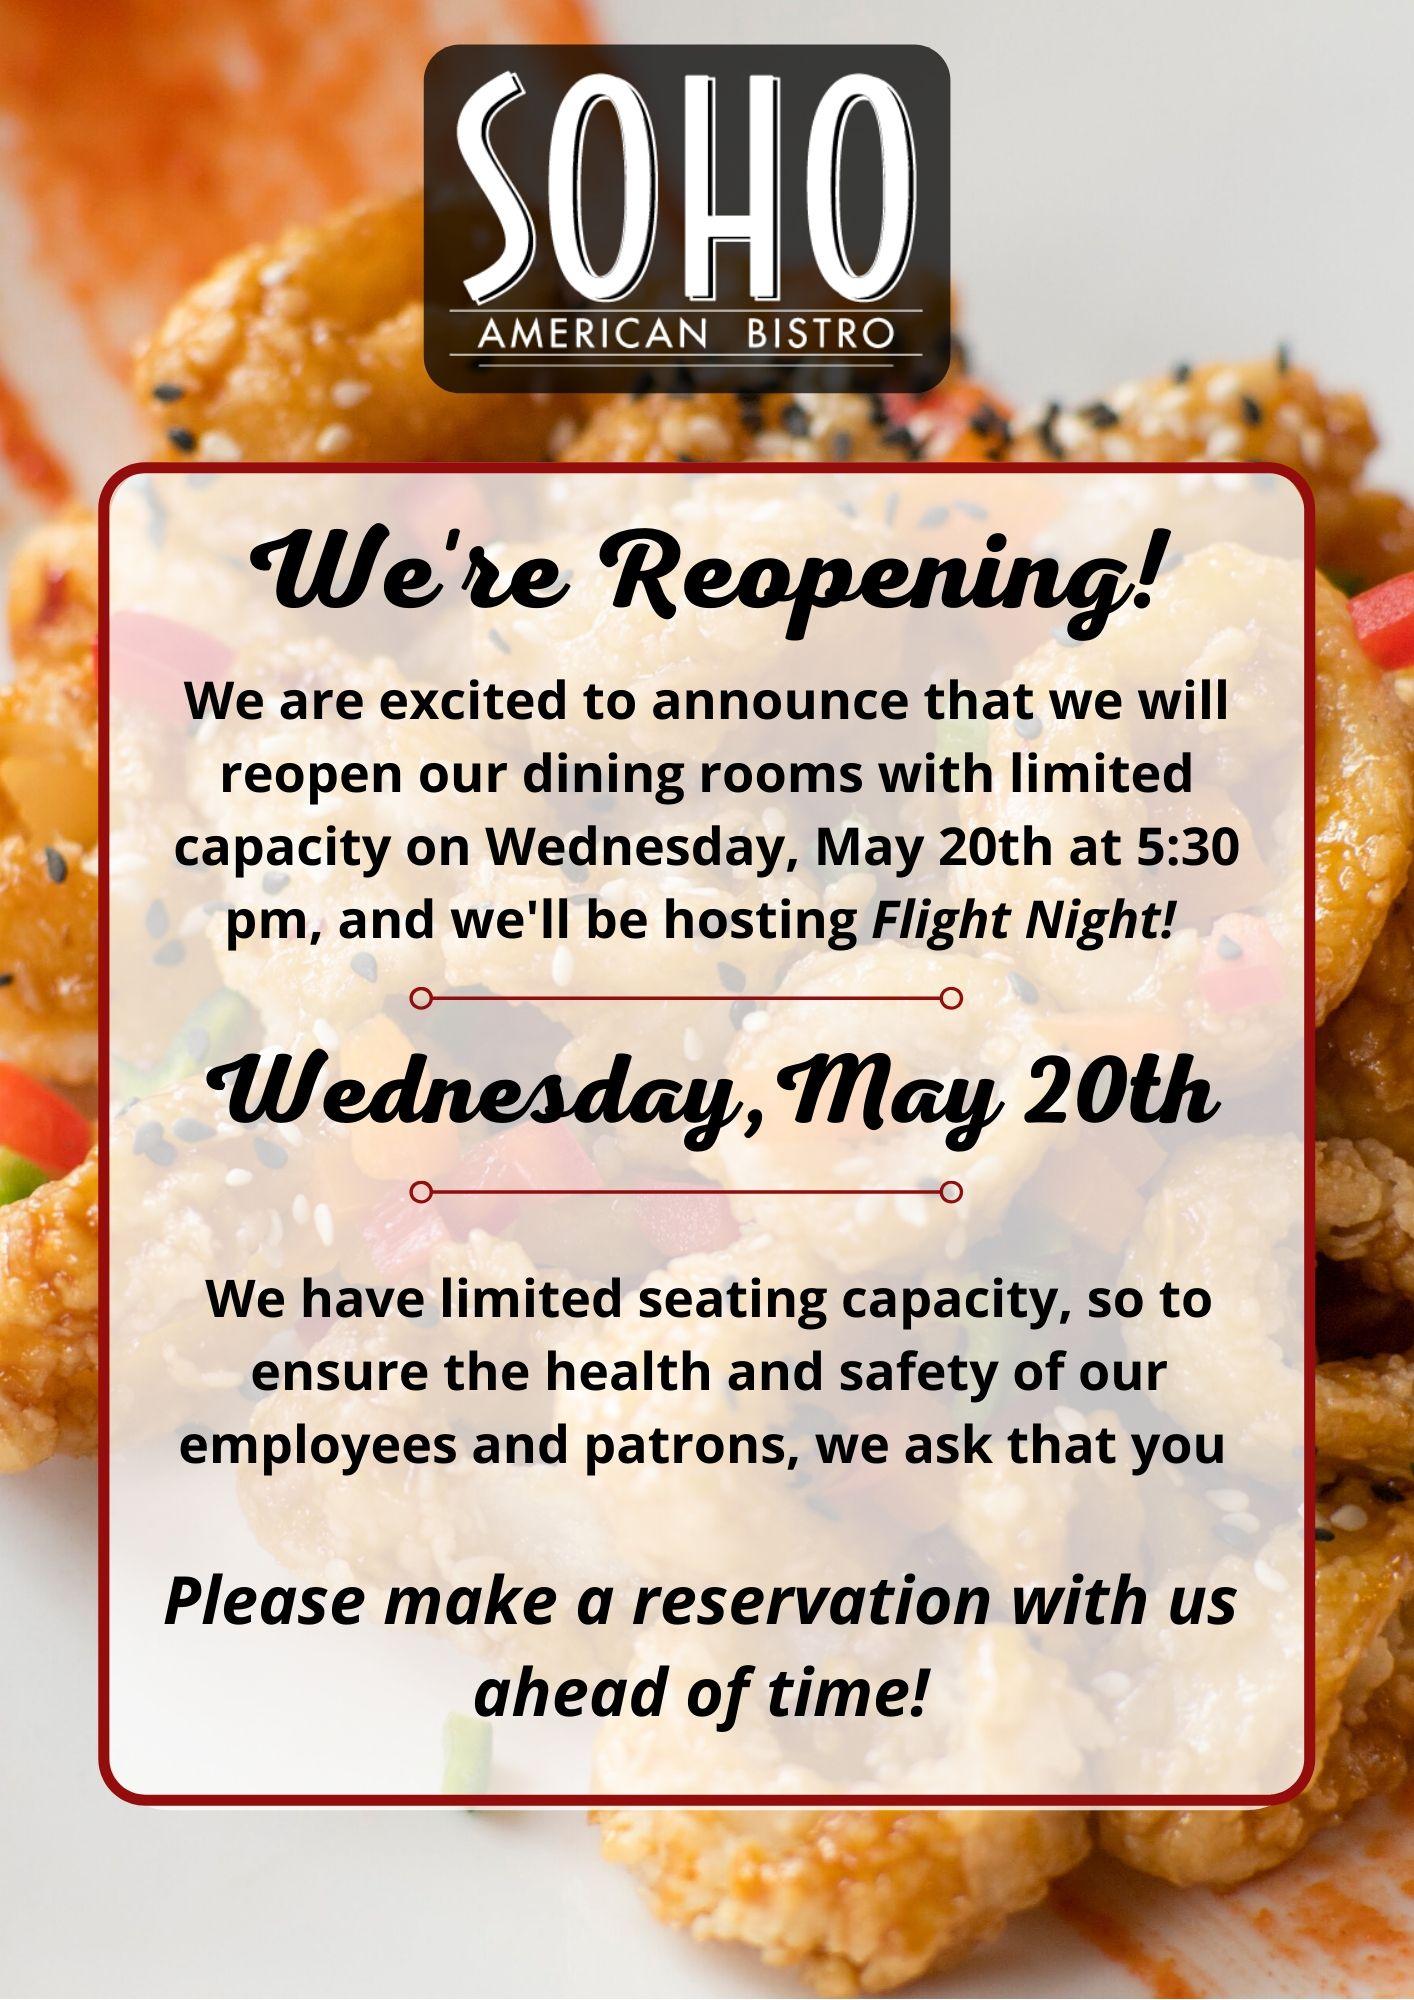 We're Reopening!